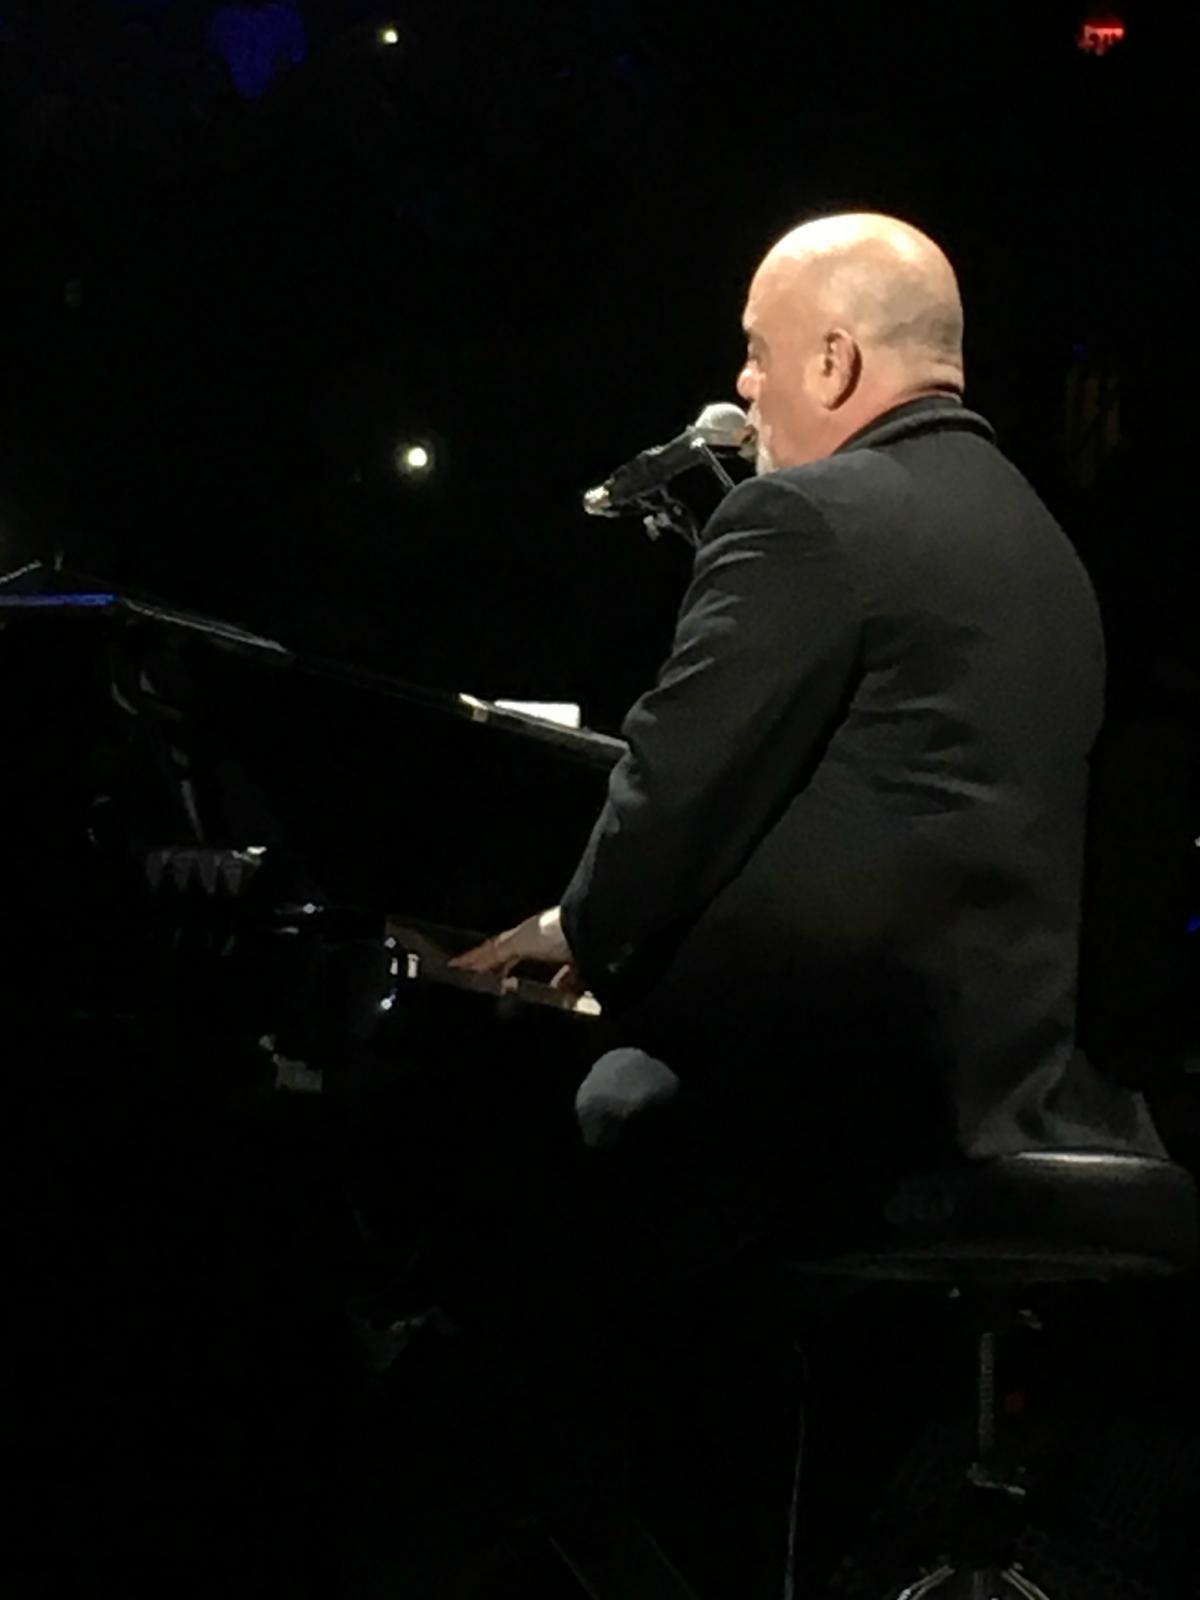 Billy Joel At Madison Square Garden December 17 2015 Billy Joel Official Site